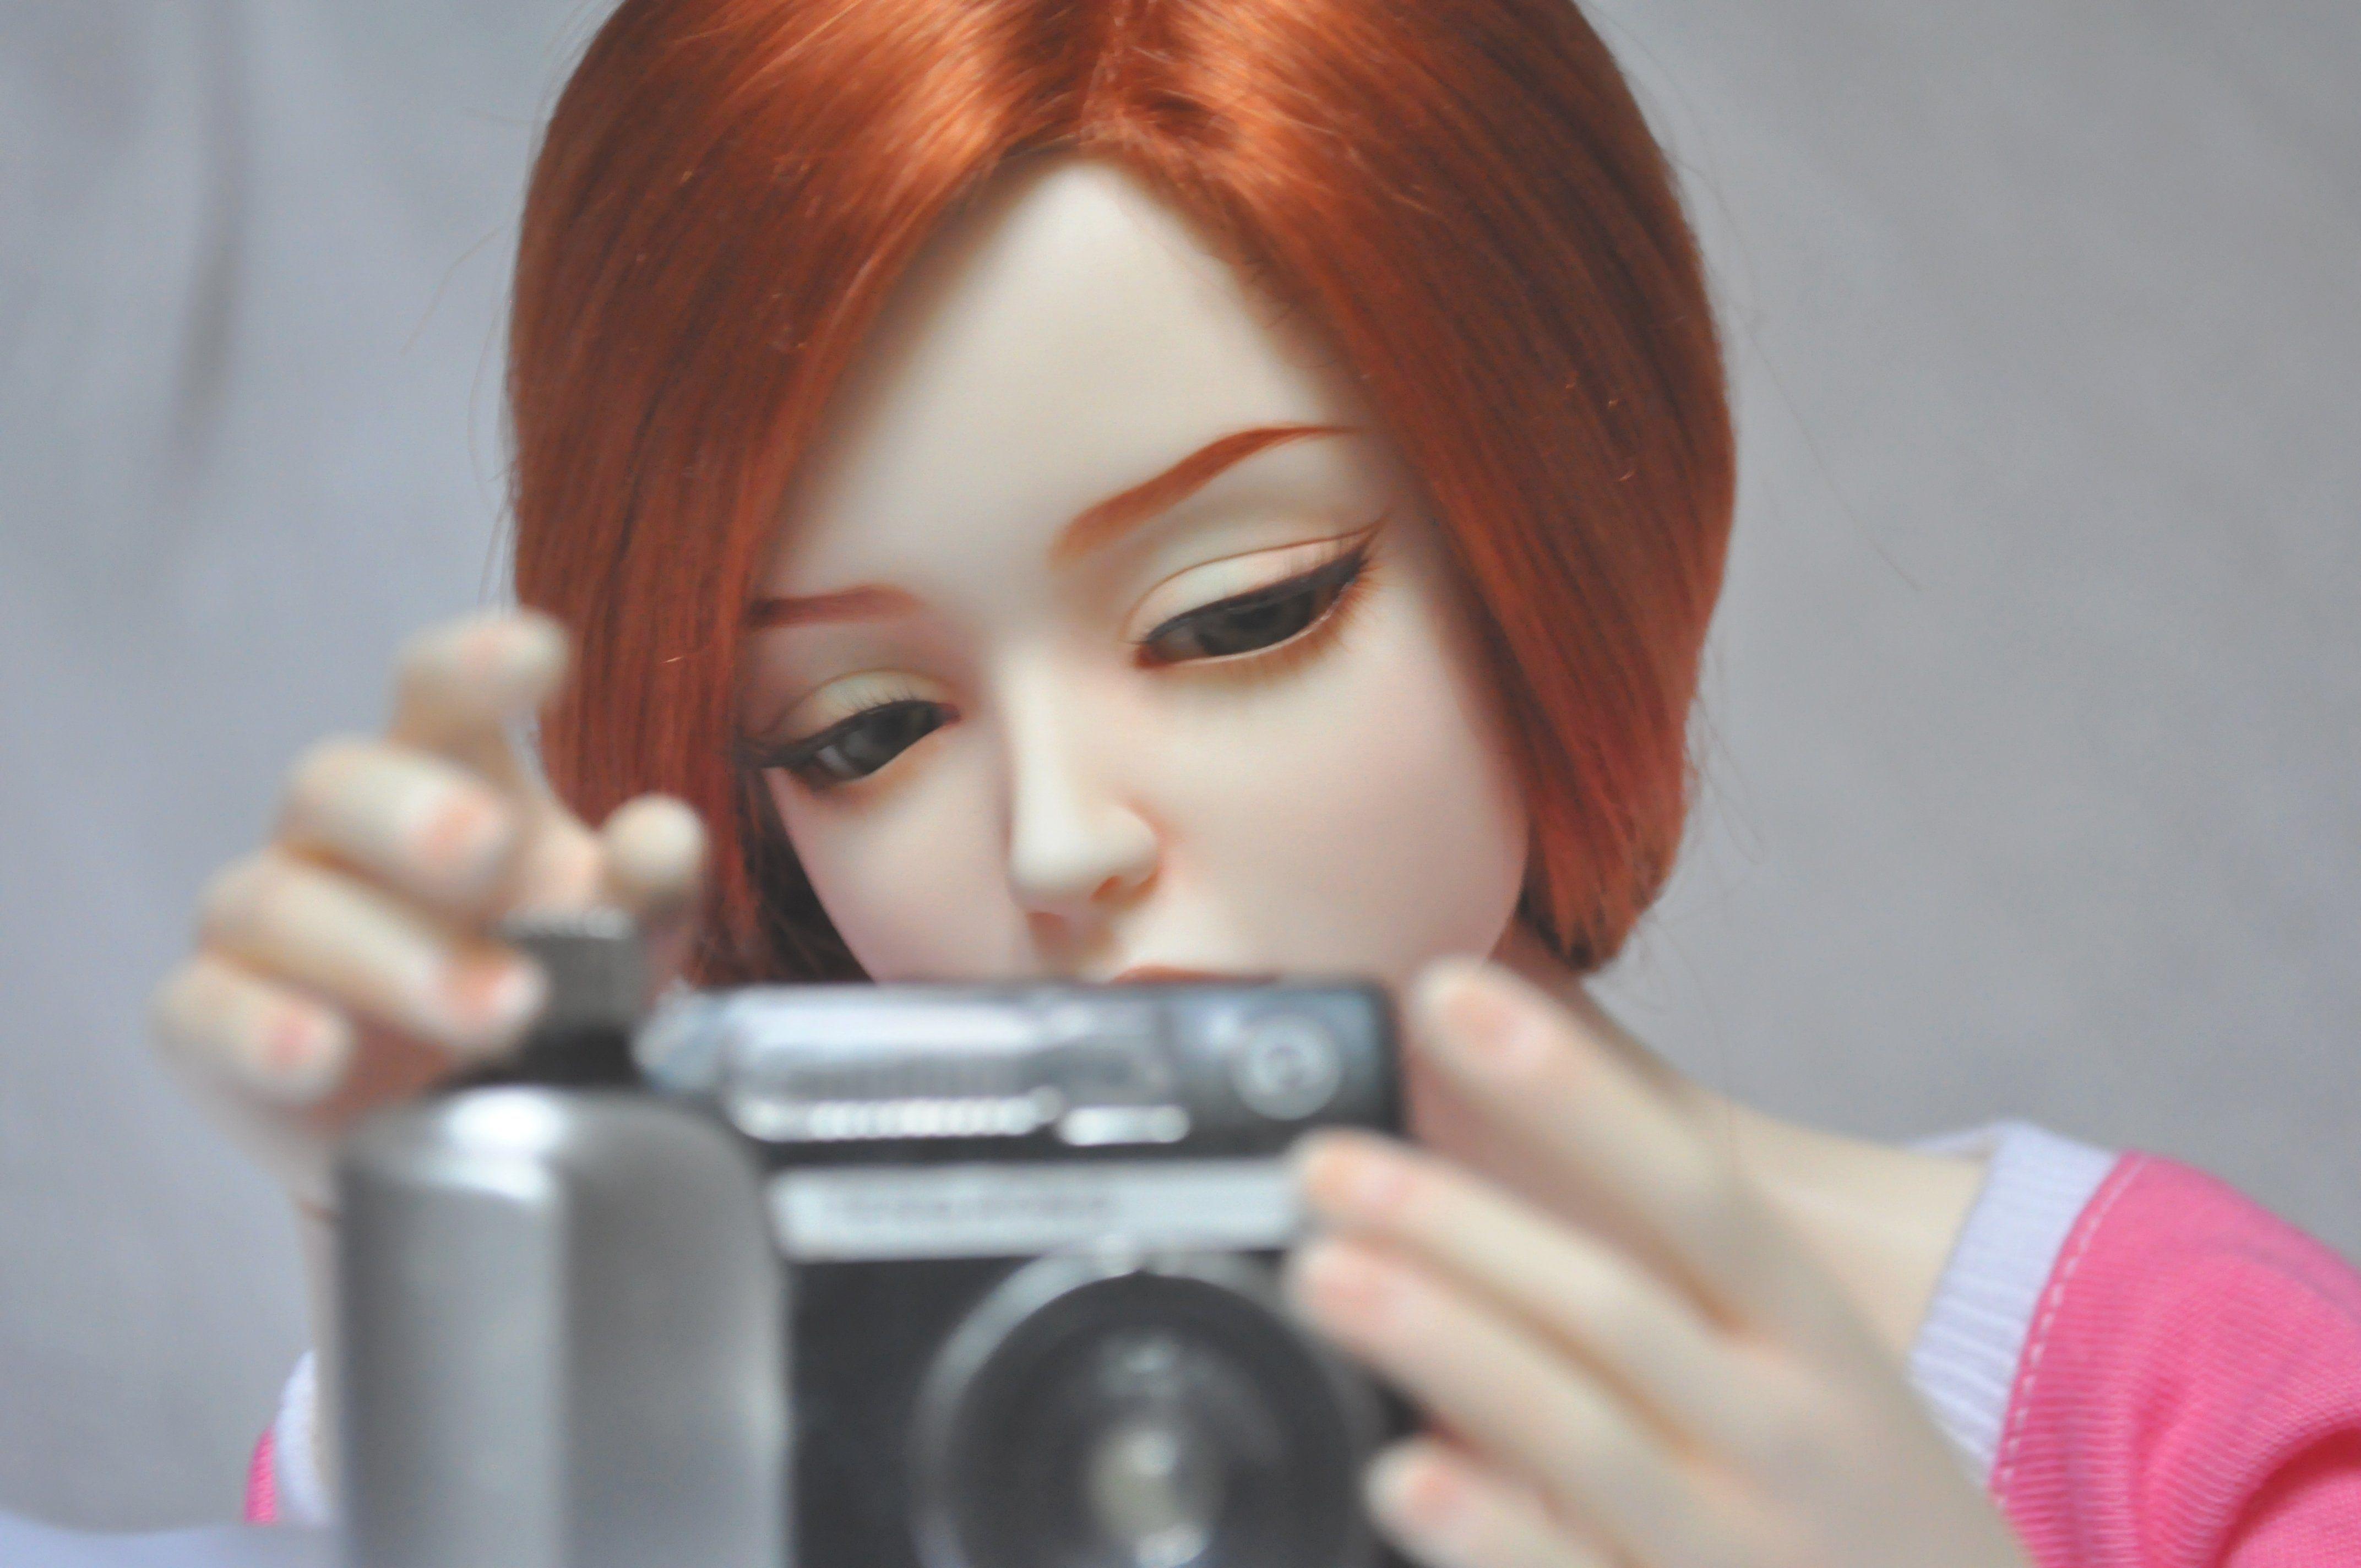 doll girl cute wallpaper find best latest doll girl cute